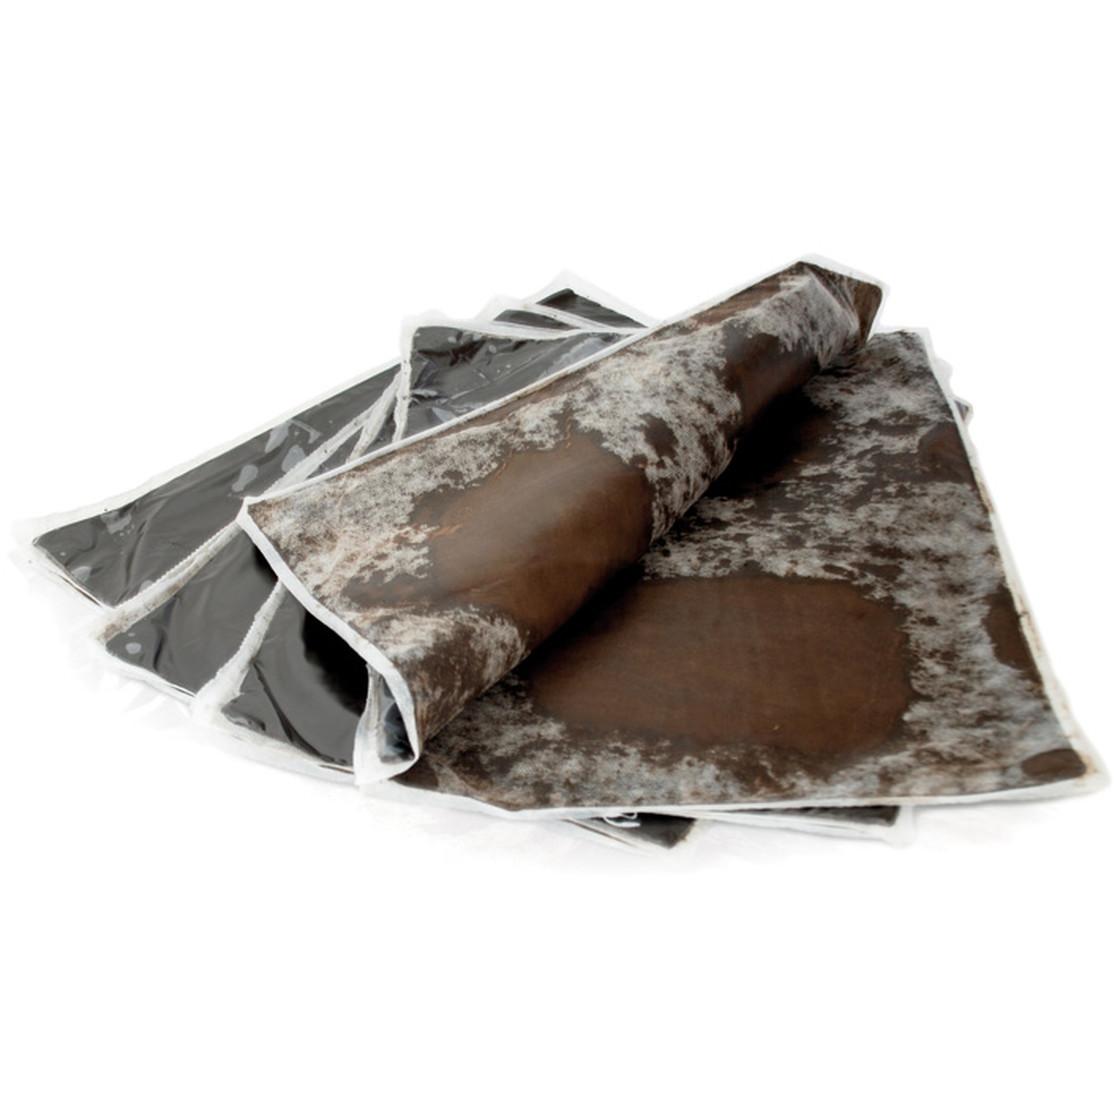 moorpackungen 40 x 60 cm 20 st ck im karton 21 90. Black Bedroom Furniture Sets. Home Design Ideas